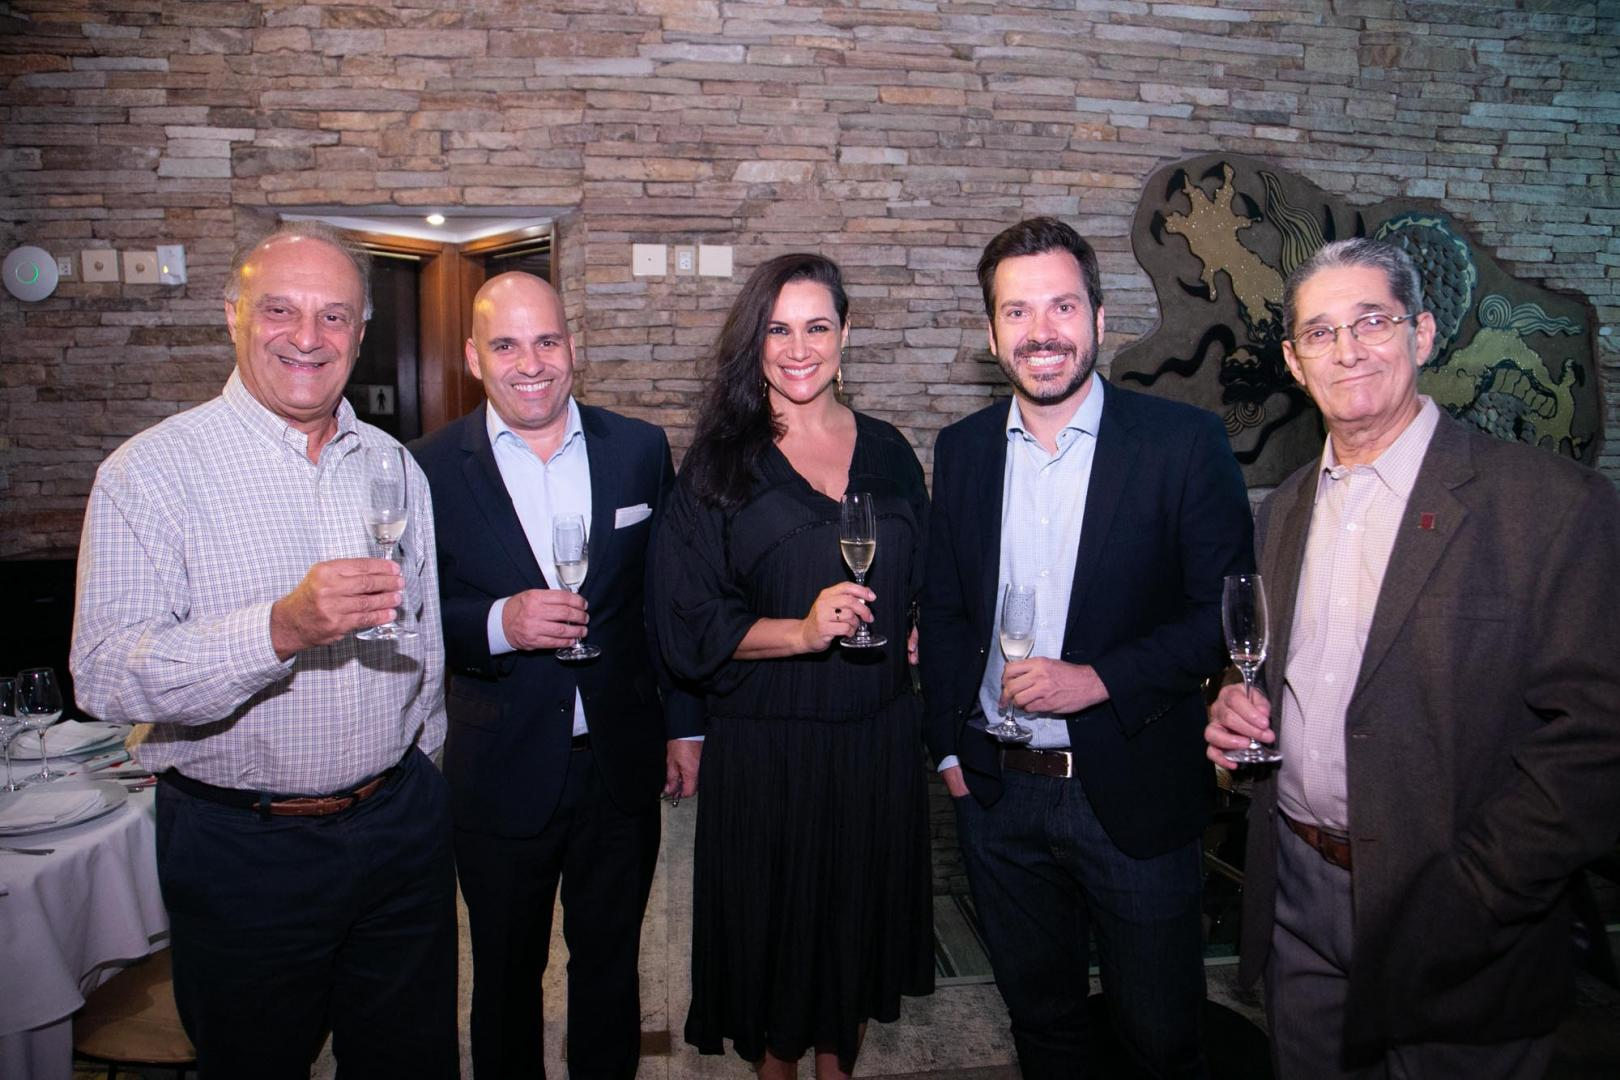 Consulado da Áustria no RJ realiza jantar harmonizado para promover vinhos austríacos